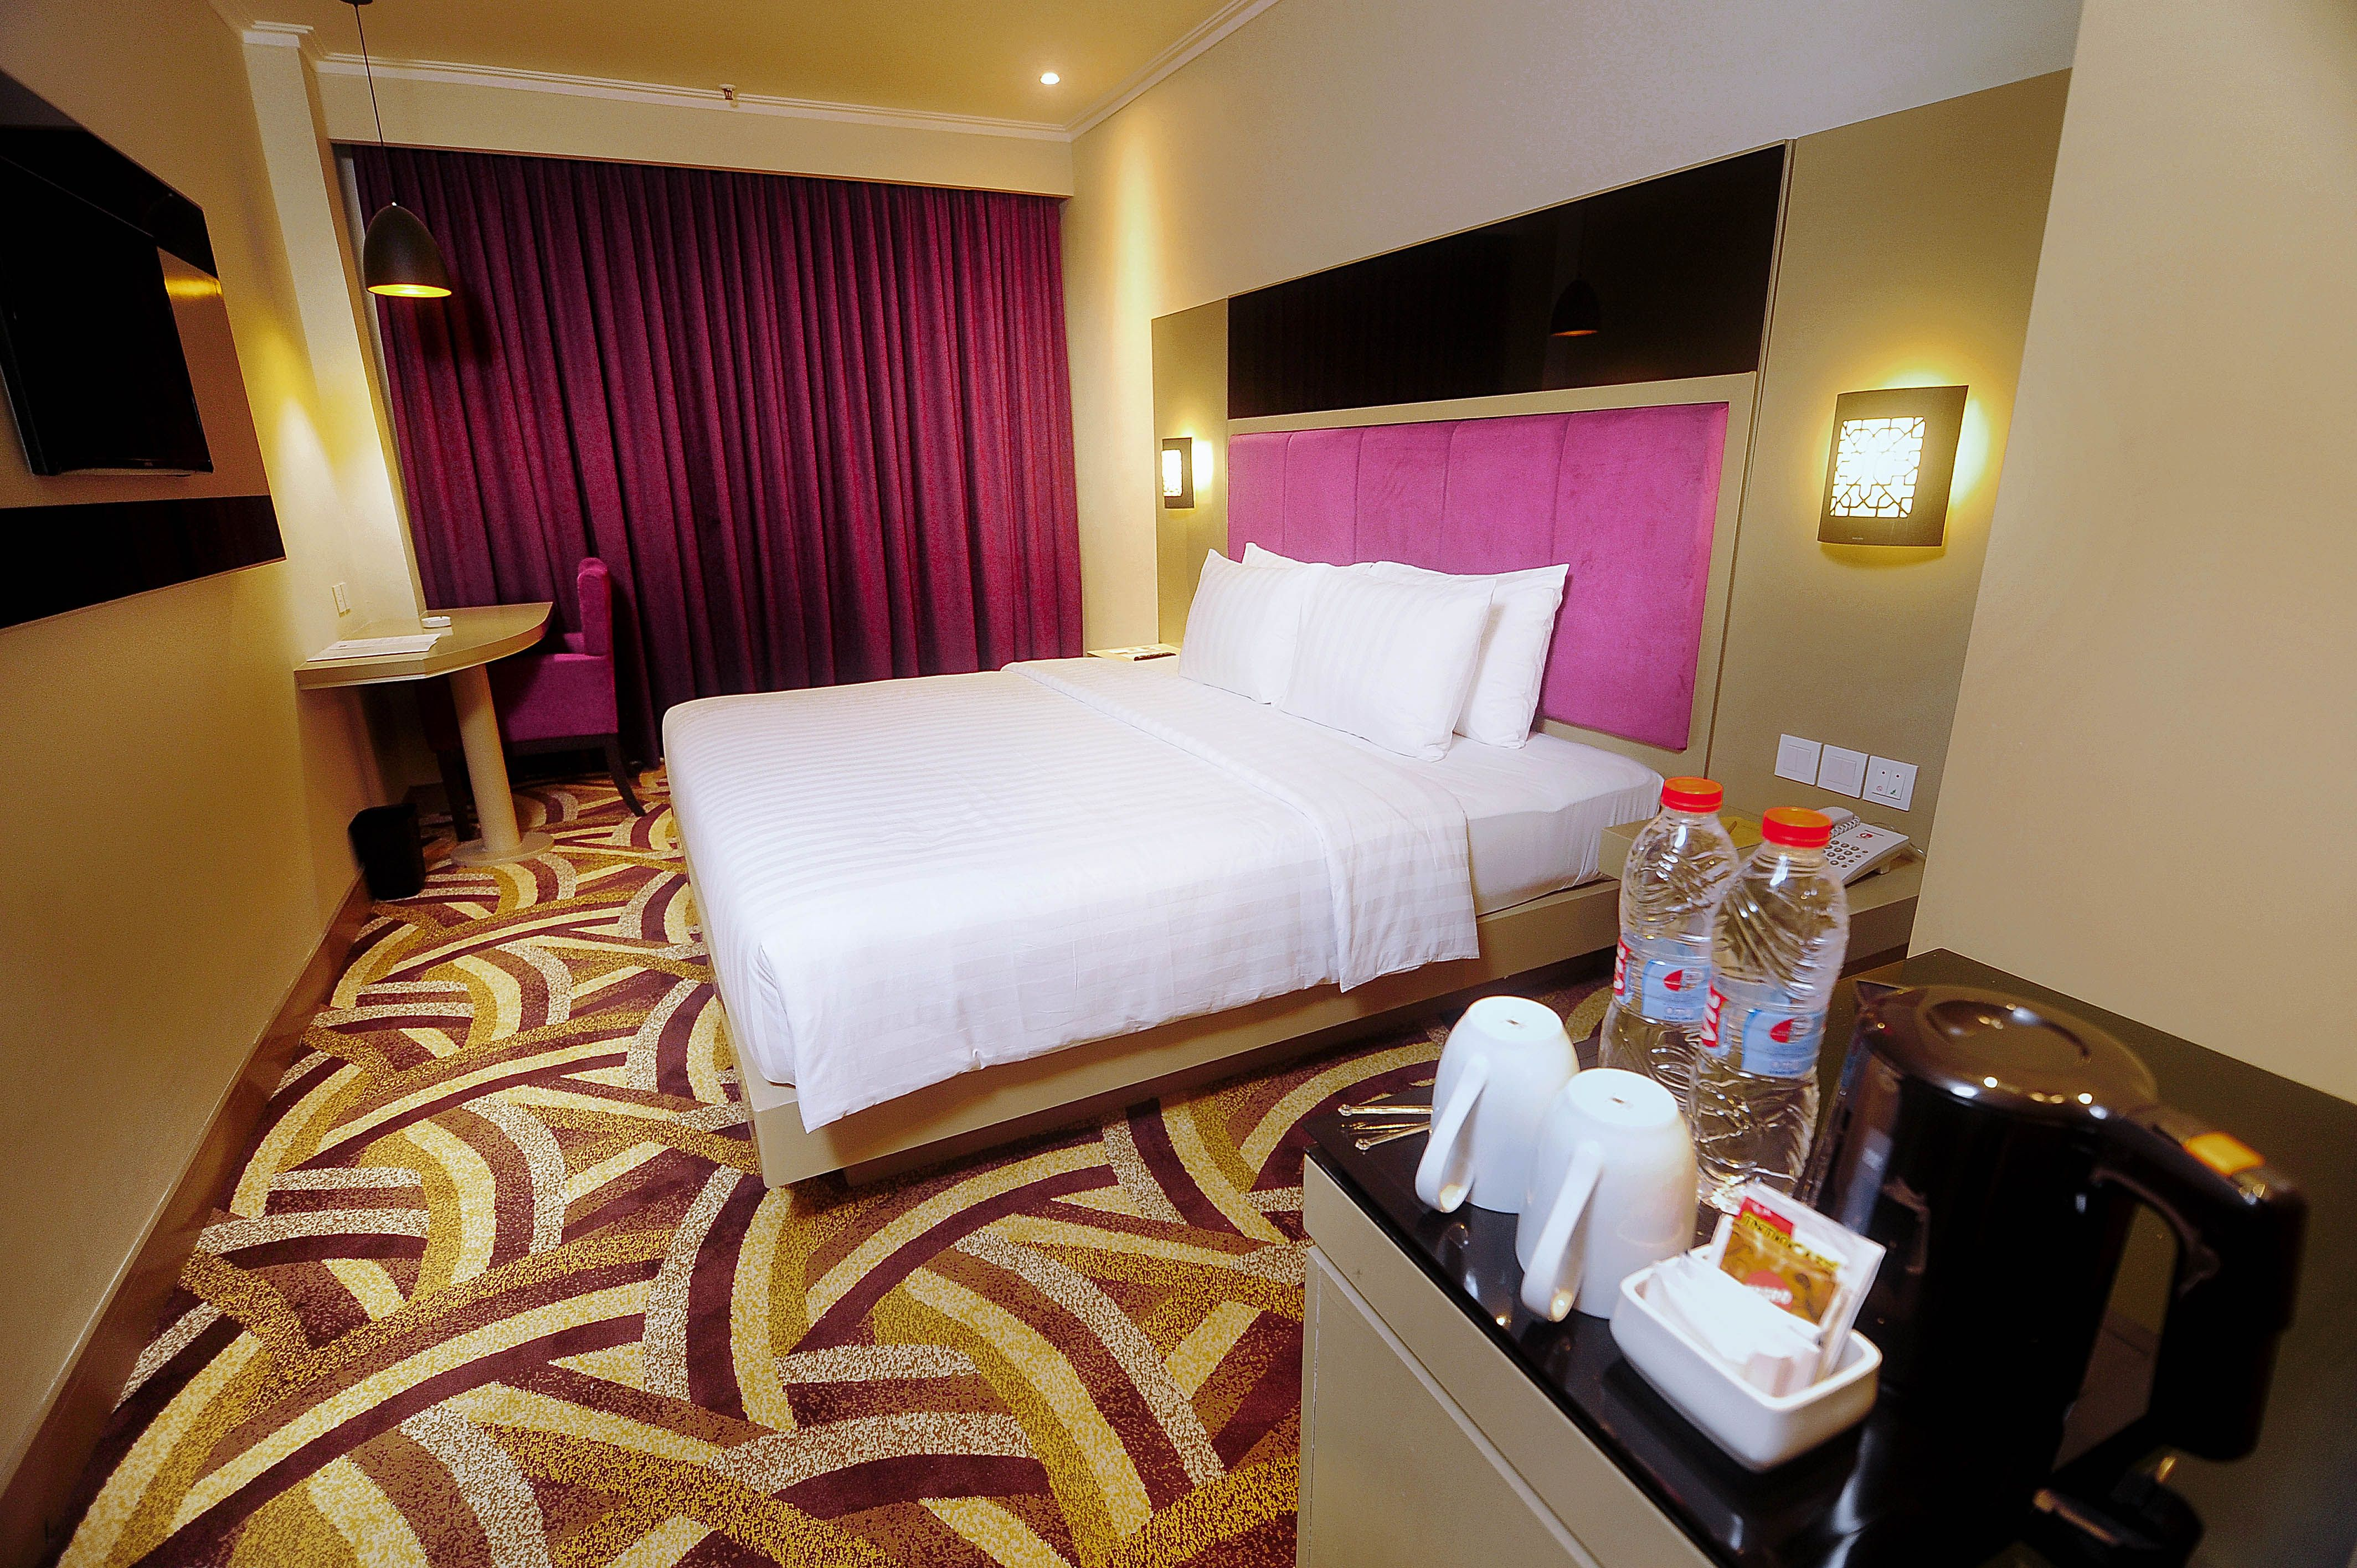 S-One Hotel Palembang by Tritama Hospitality, Palembang